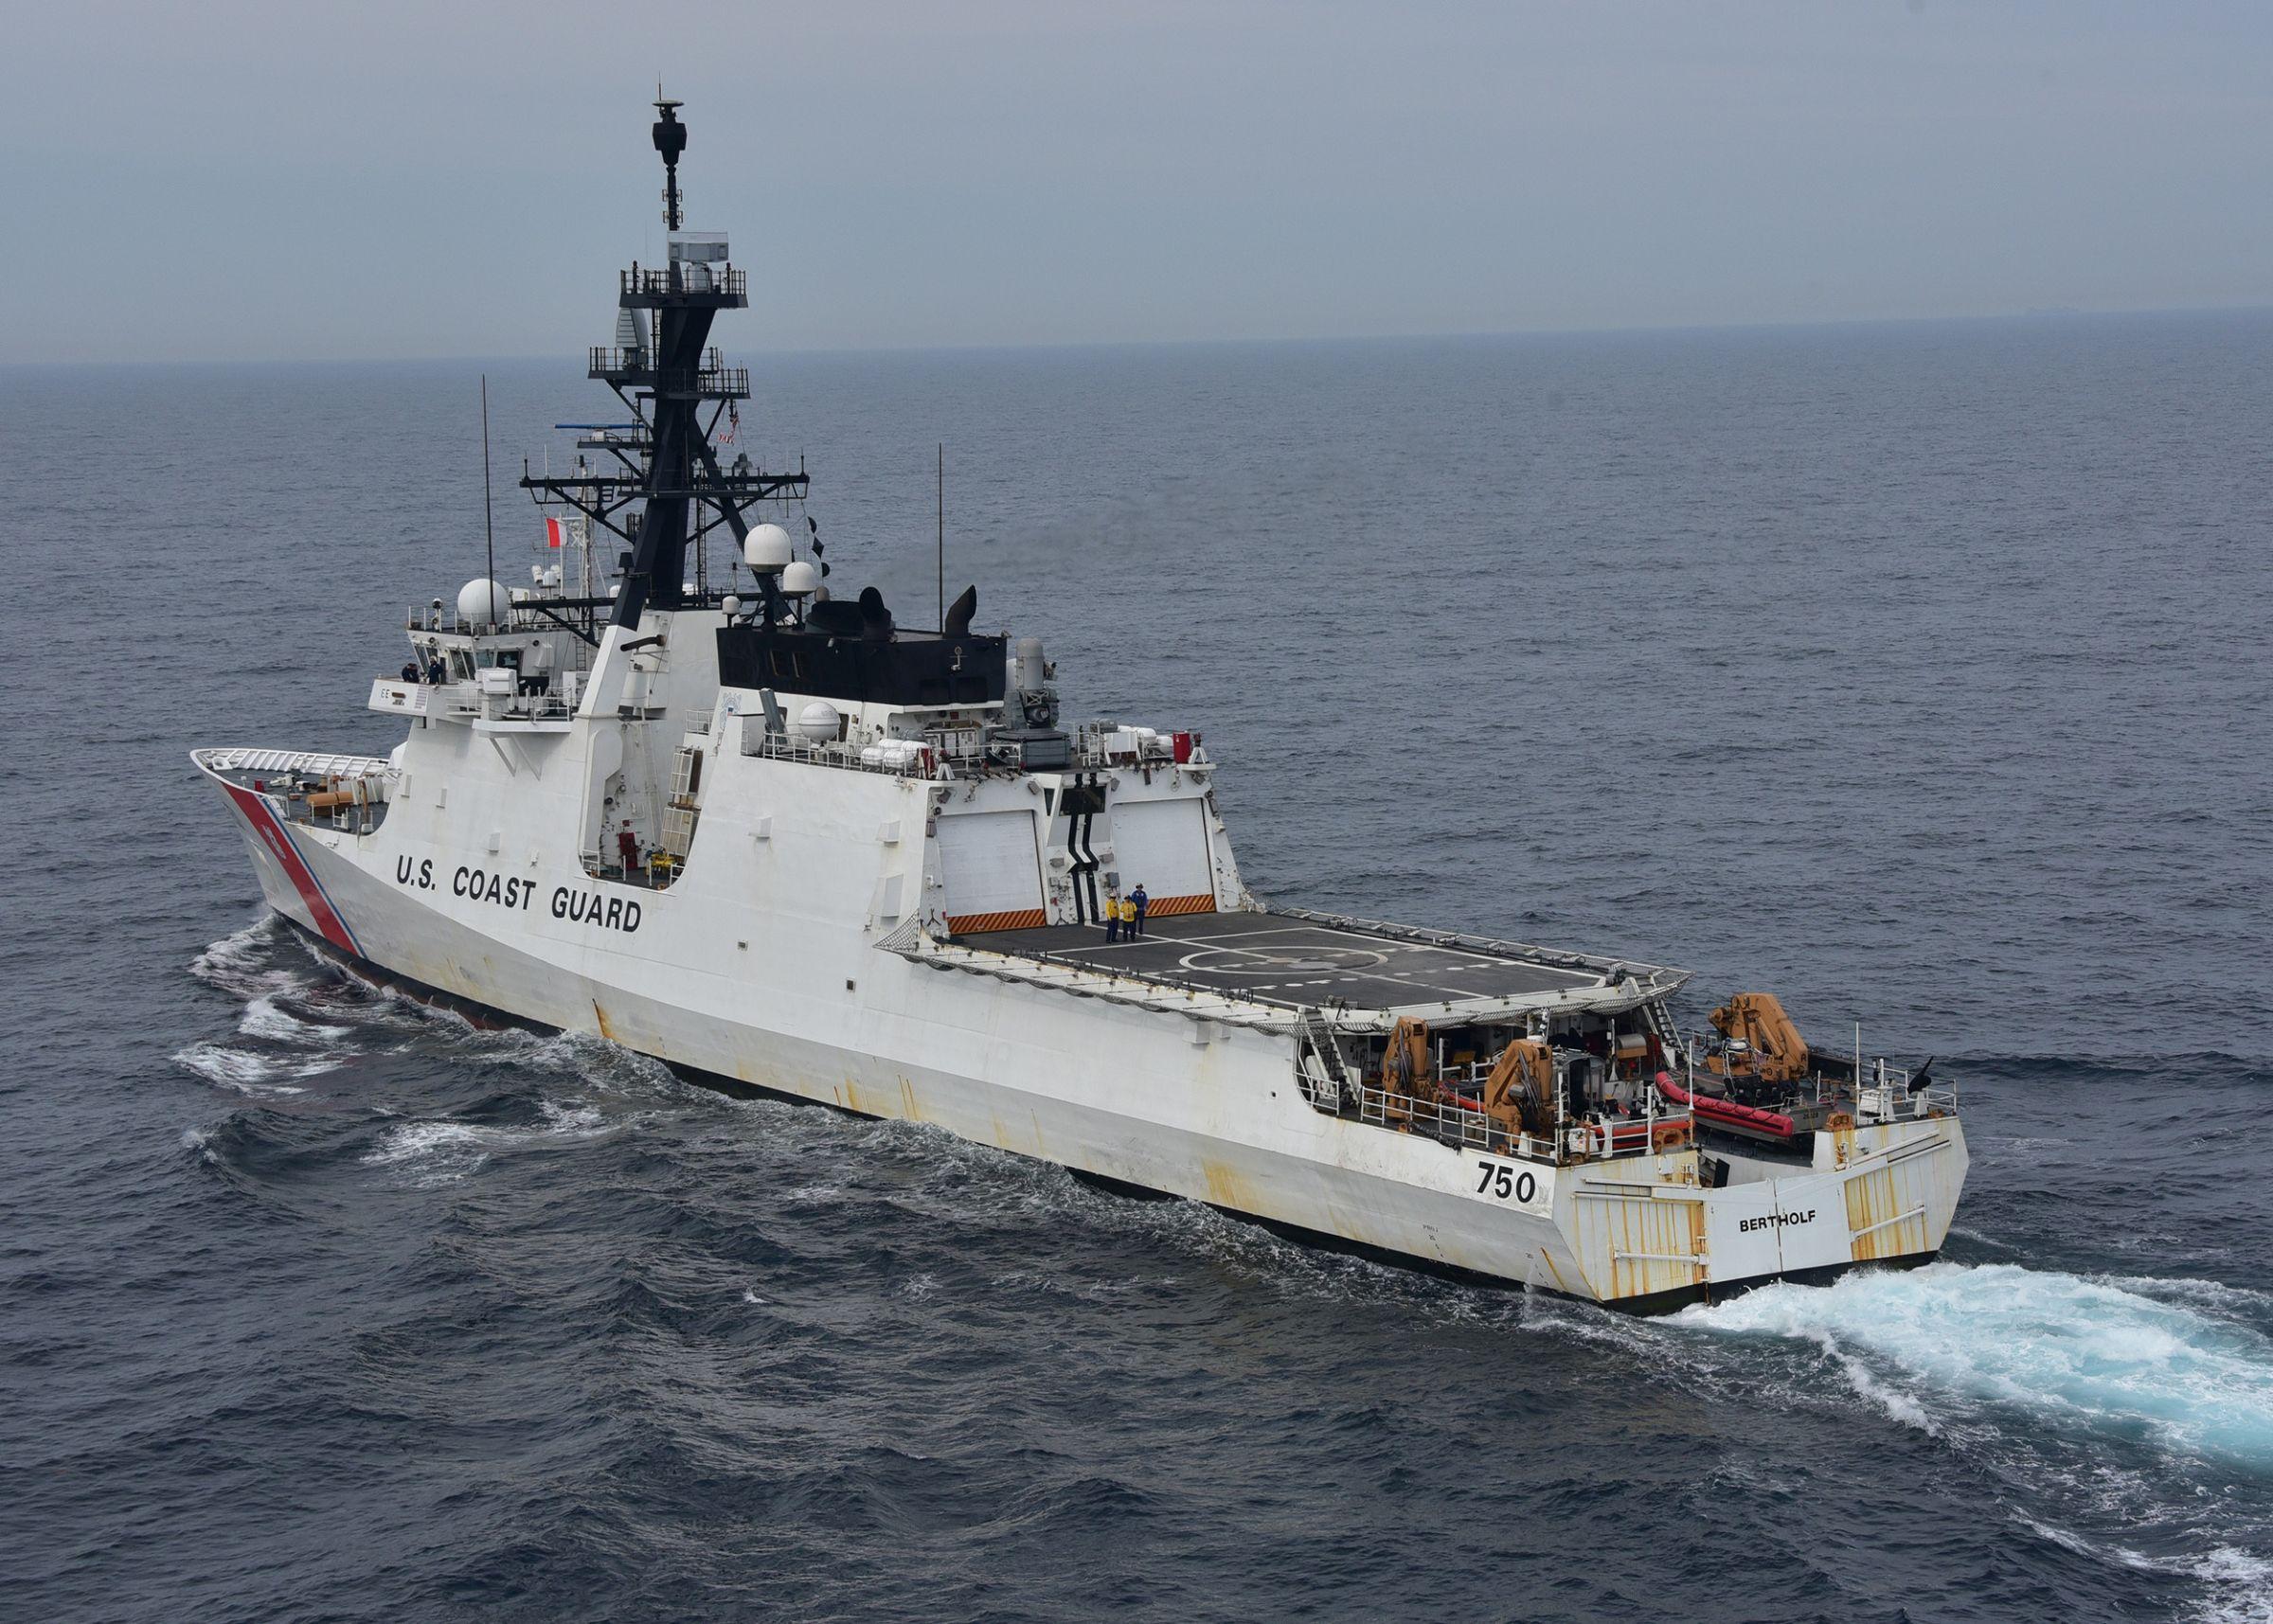 U. S. Coast Guard (garde-côtes des États-Unis) - Page 2 48347481507_8d4edea2b0_o